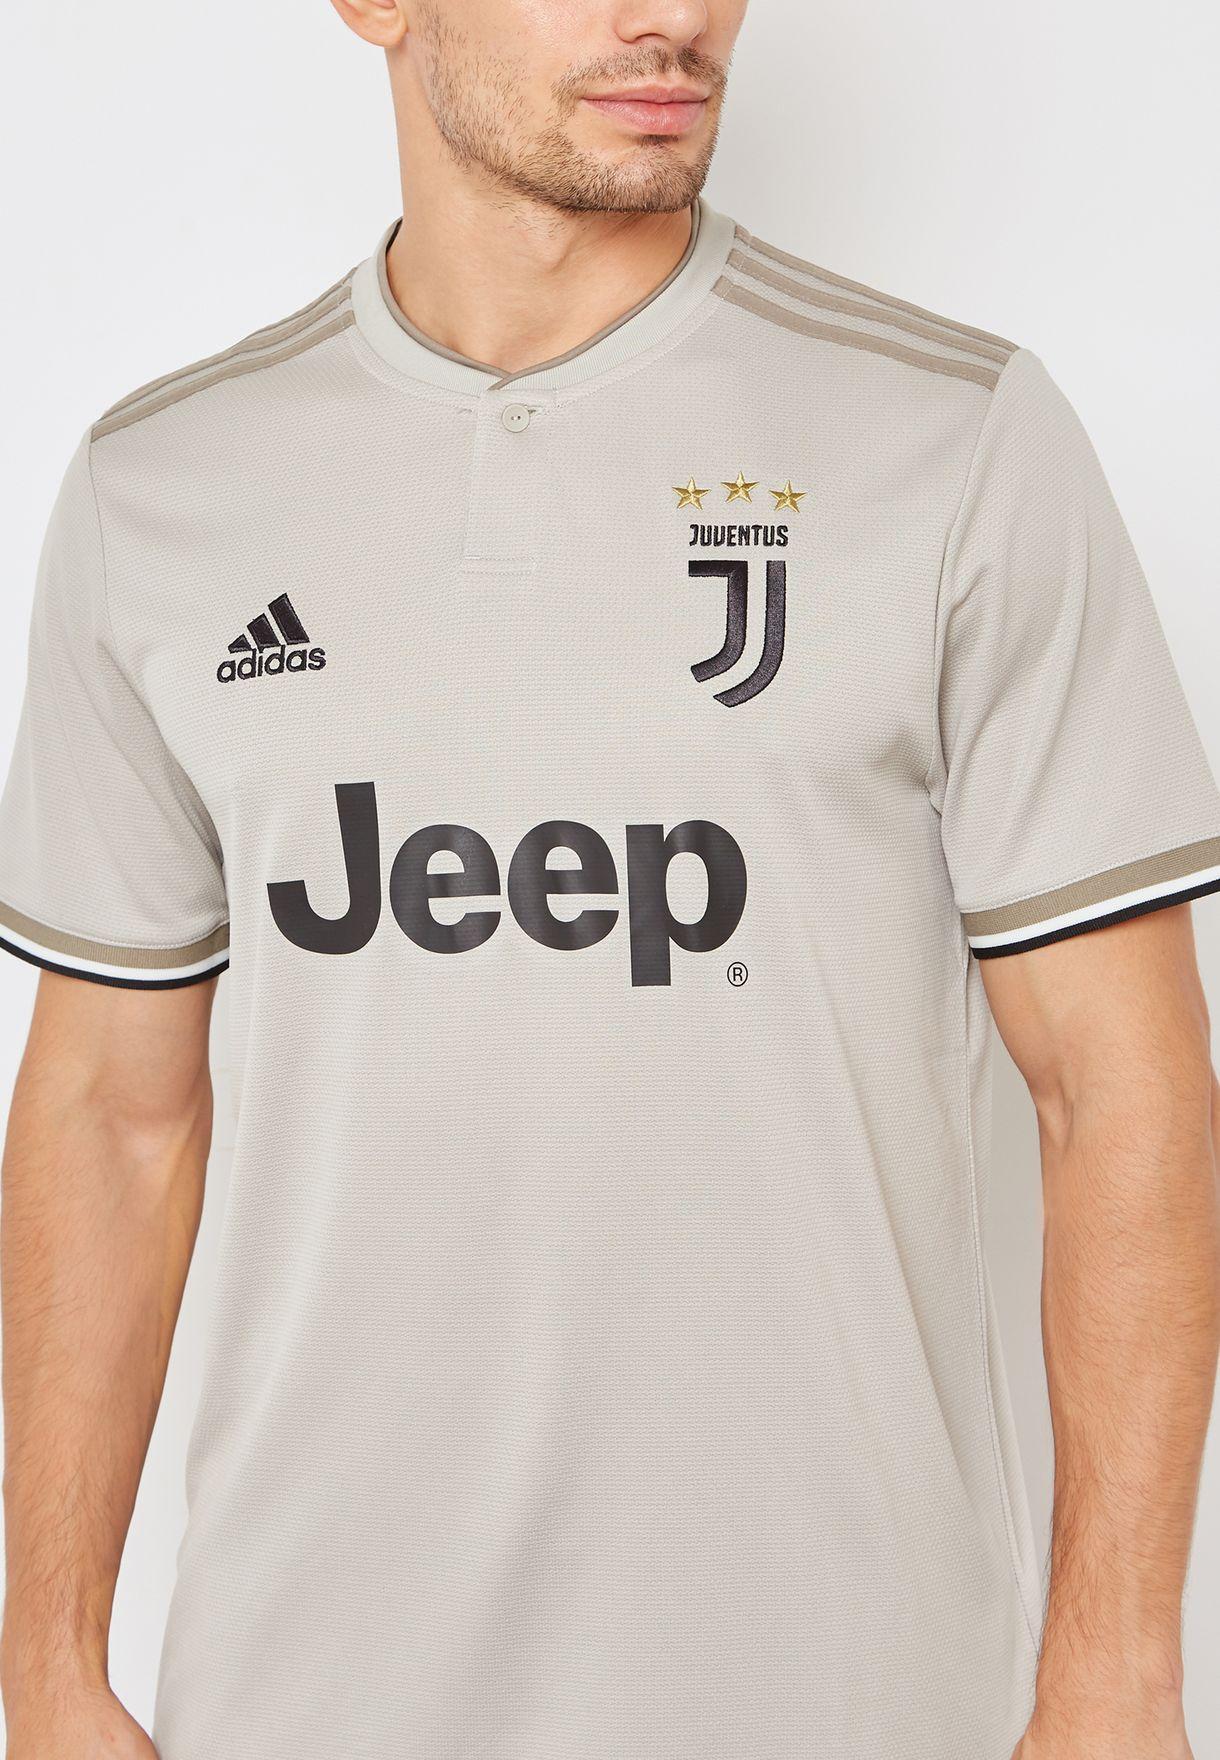 best service 3a23a 9ea96 Juventus 18/19 Away Jersey